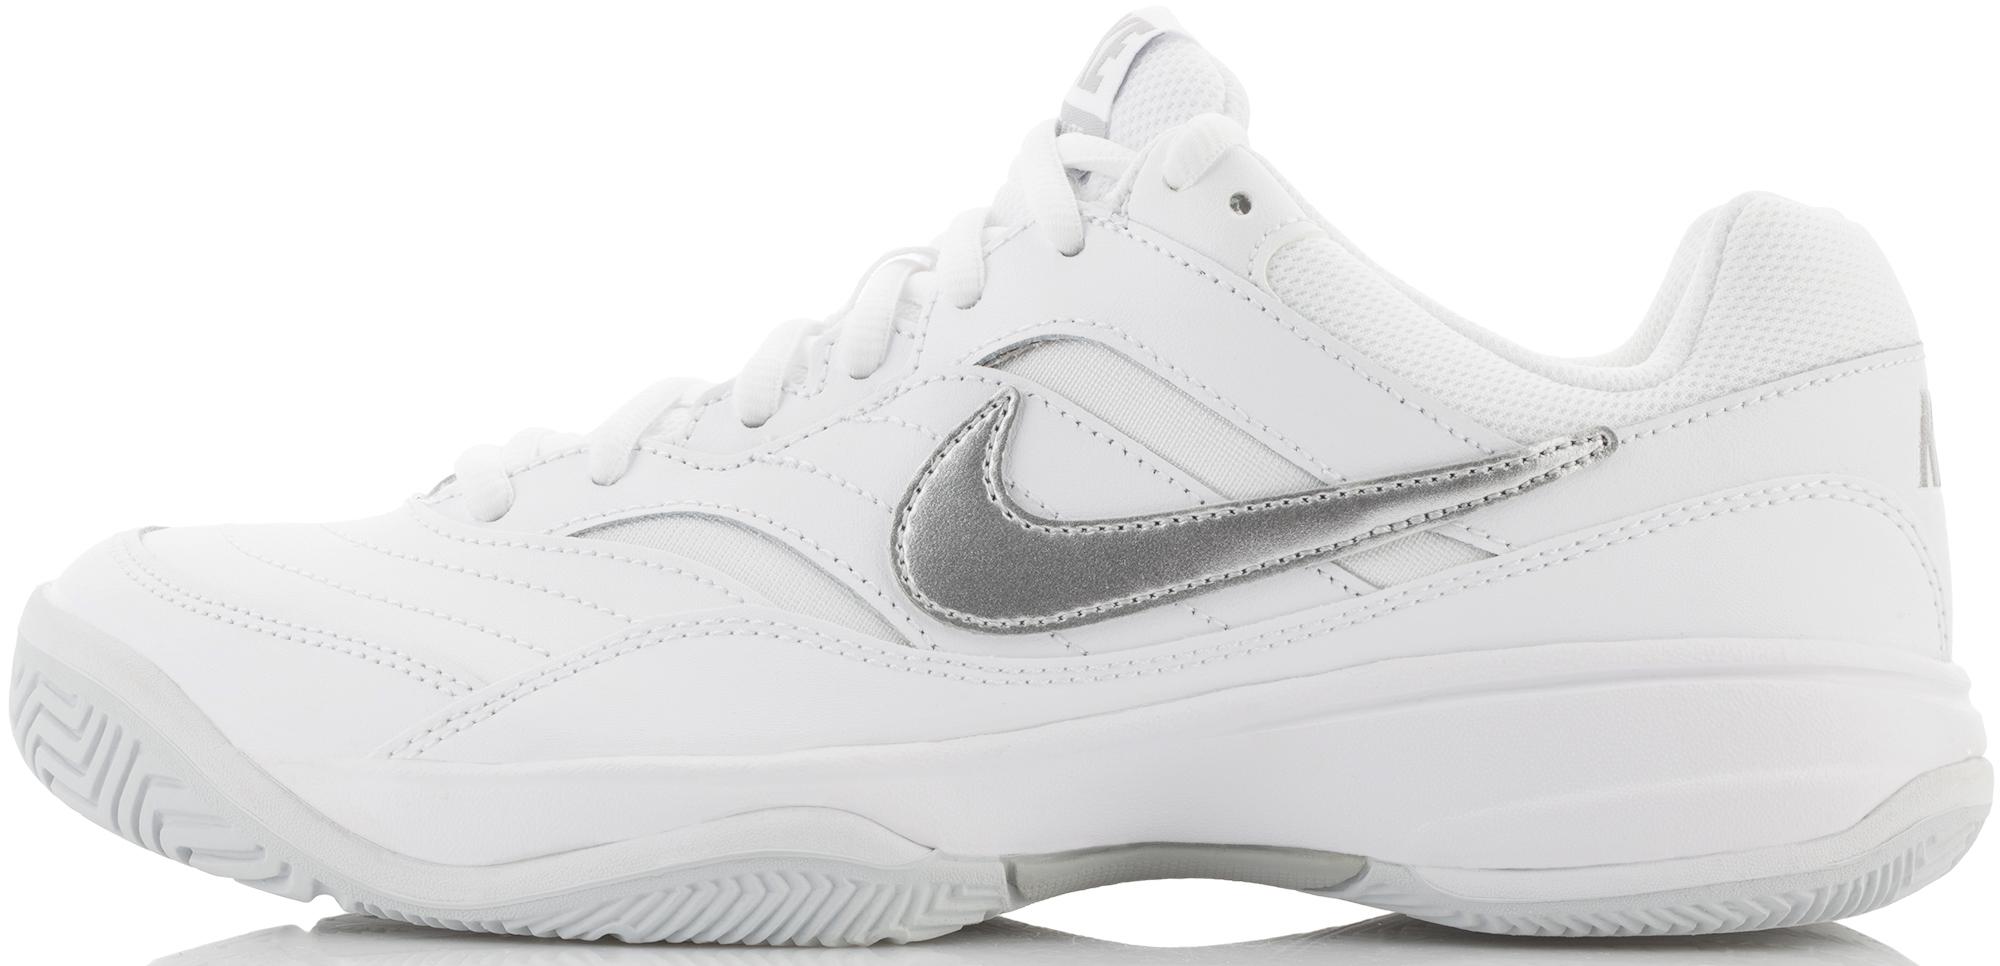 Nike Кроссовки женские Nike Court Lite, размер 39,5 кроссовки для тенниса мужские nike court lite цвет белый 845021 100 размер 10 5 43 5